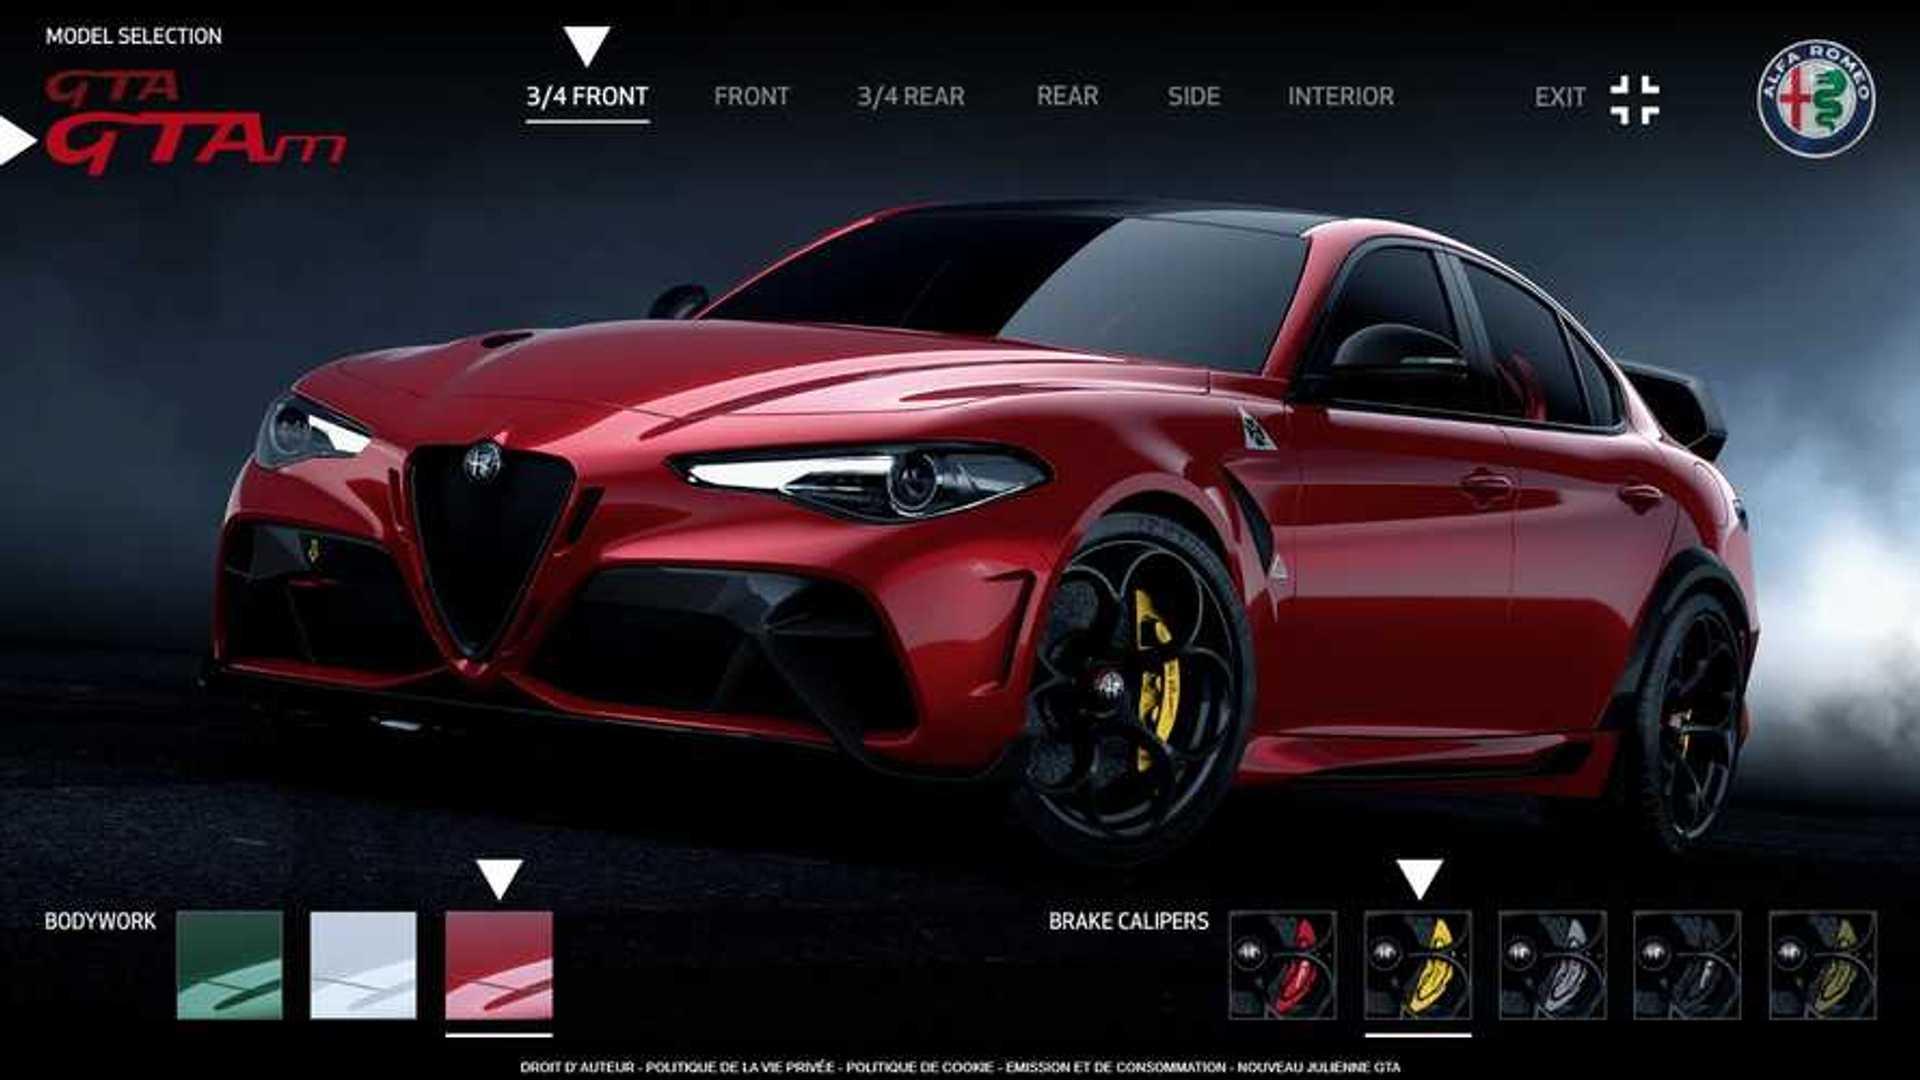 Voici les prix des Alfa Romeo Giulia GTA et GTAm